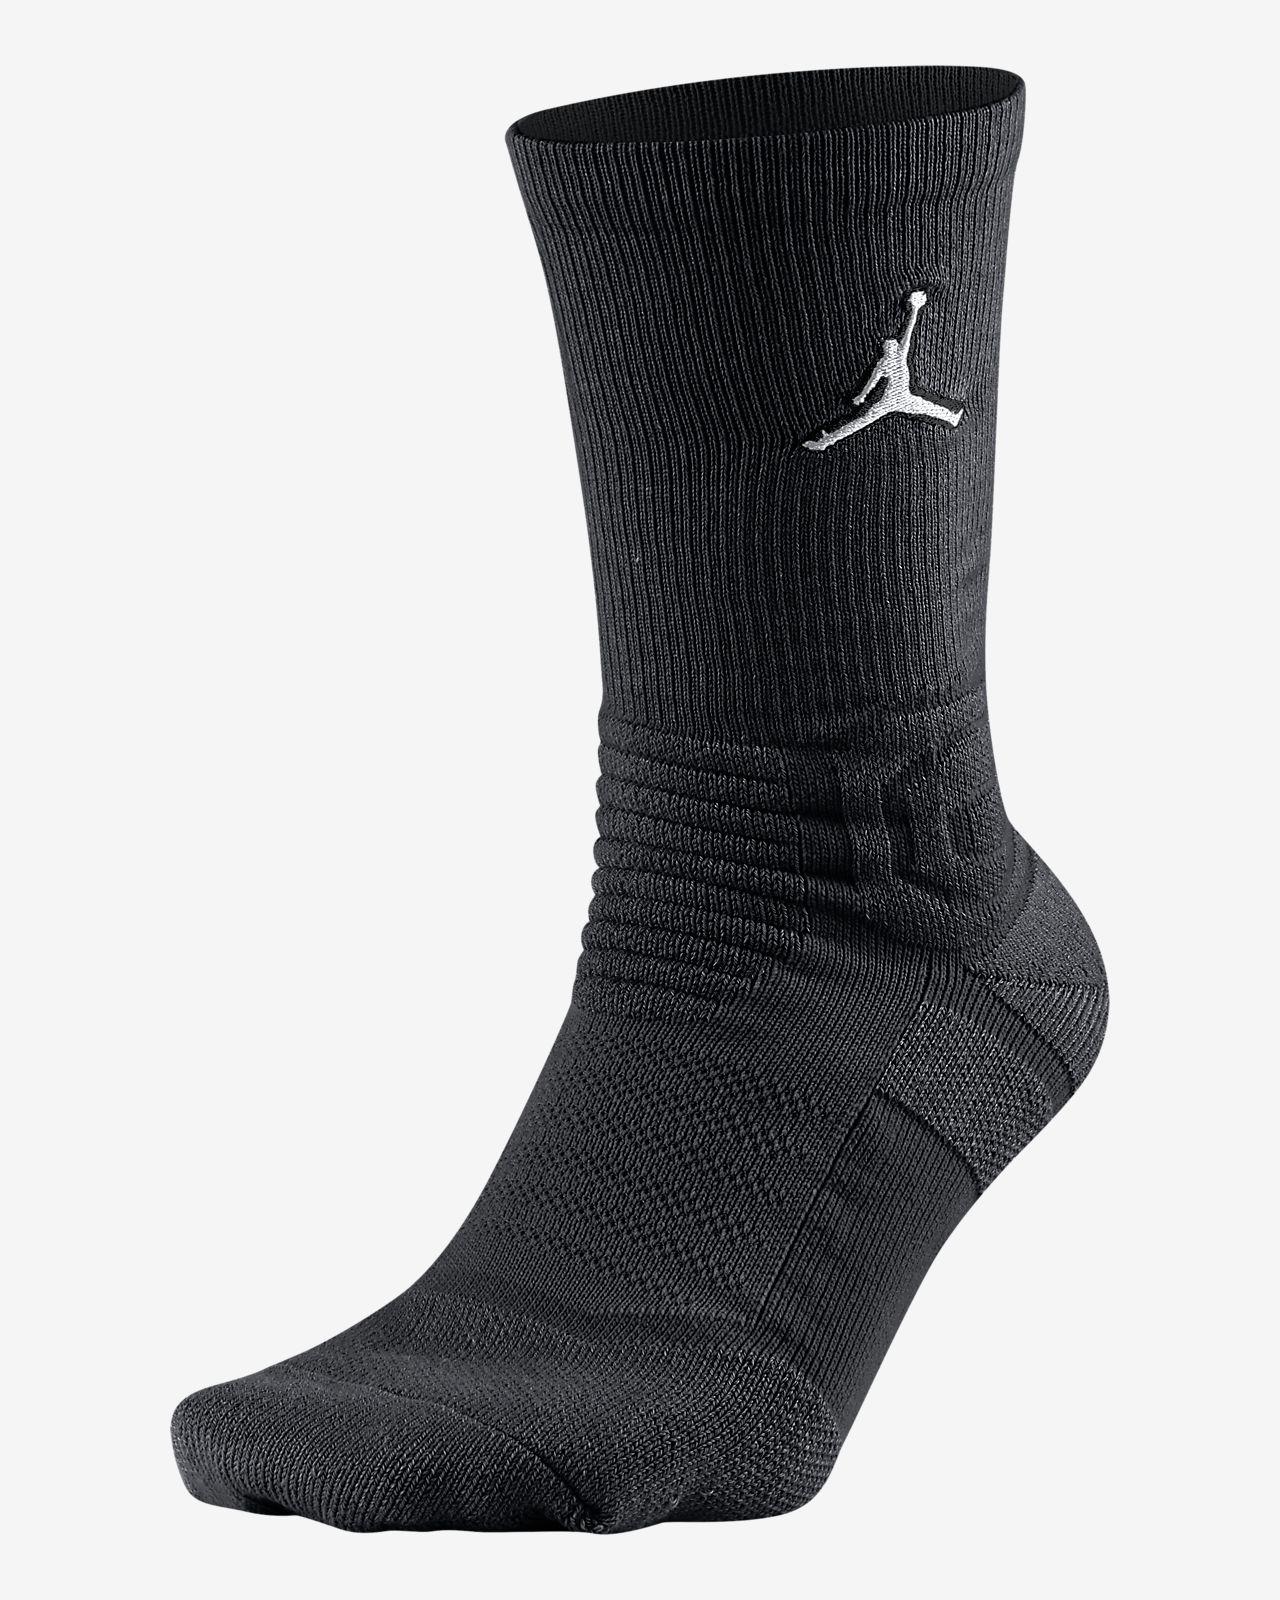 Jordan Ultimate Flight 2.0 Crew 籃球襪